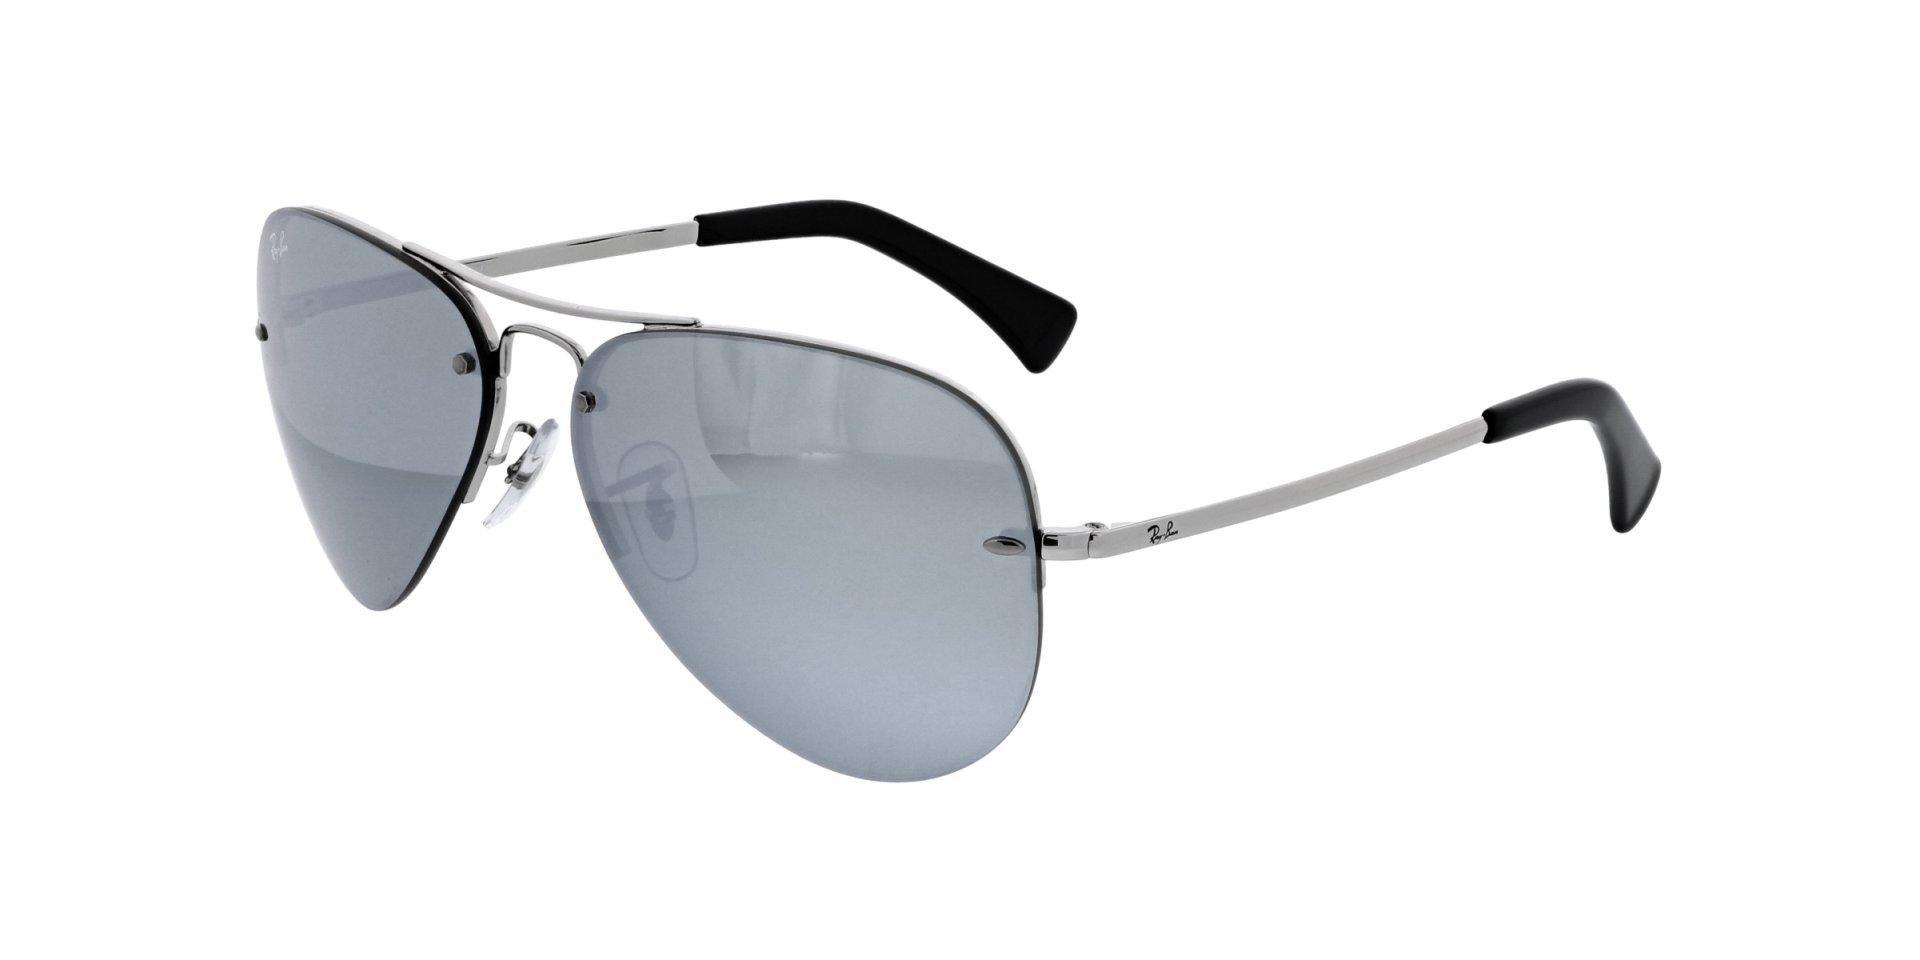 6e8db192f0 Sunglasses RAY BAN